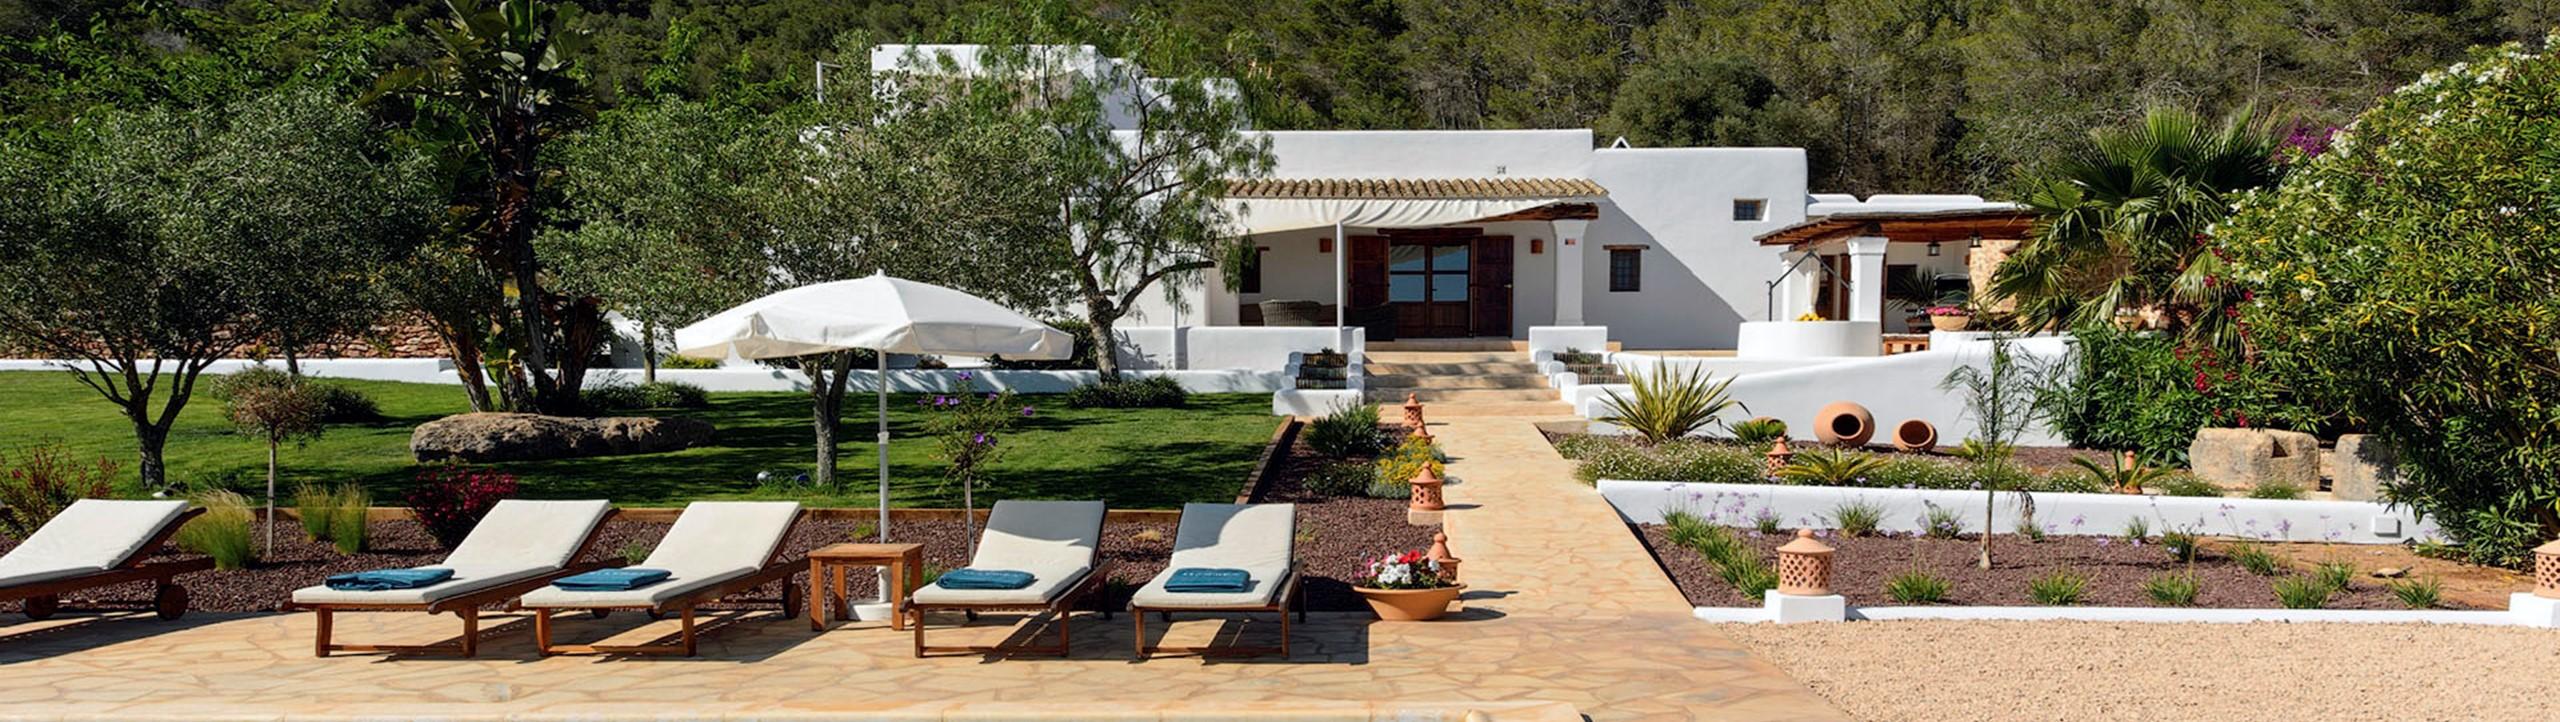 Villa Finca Mago Ibiza 1 Near Santa Gertrudis Unique Ibiza Villas